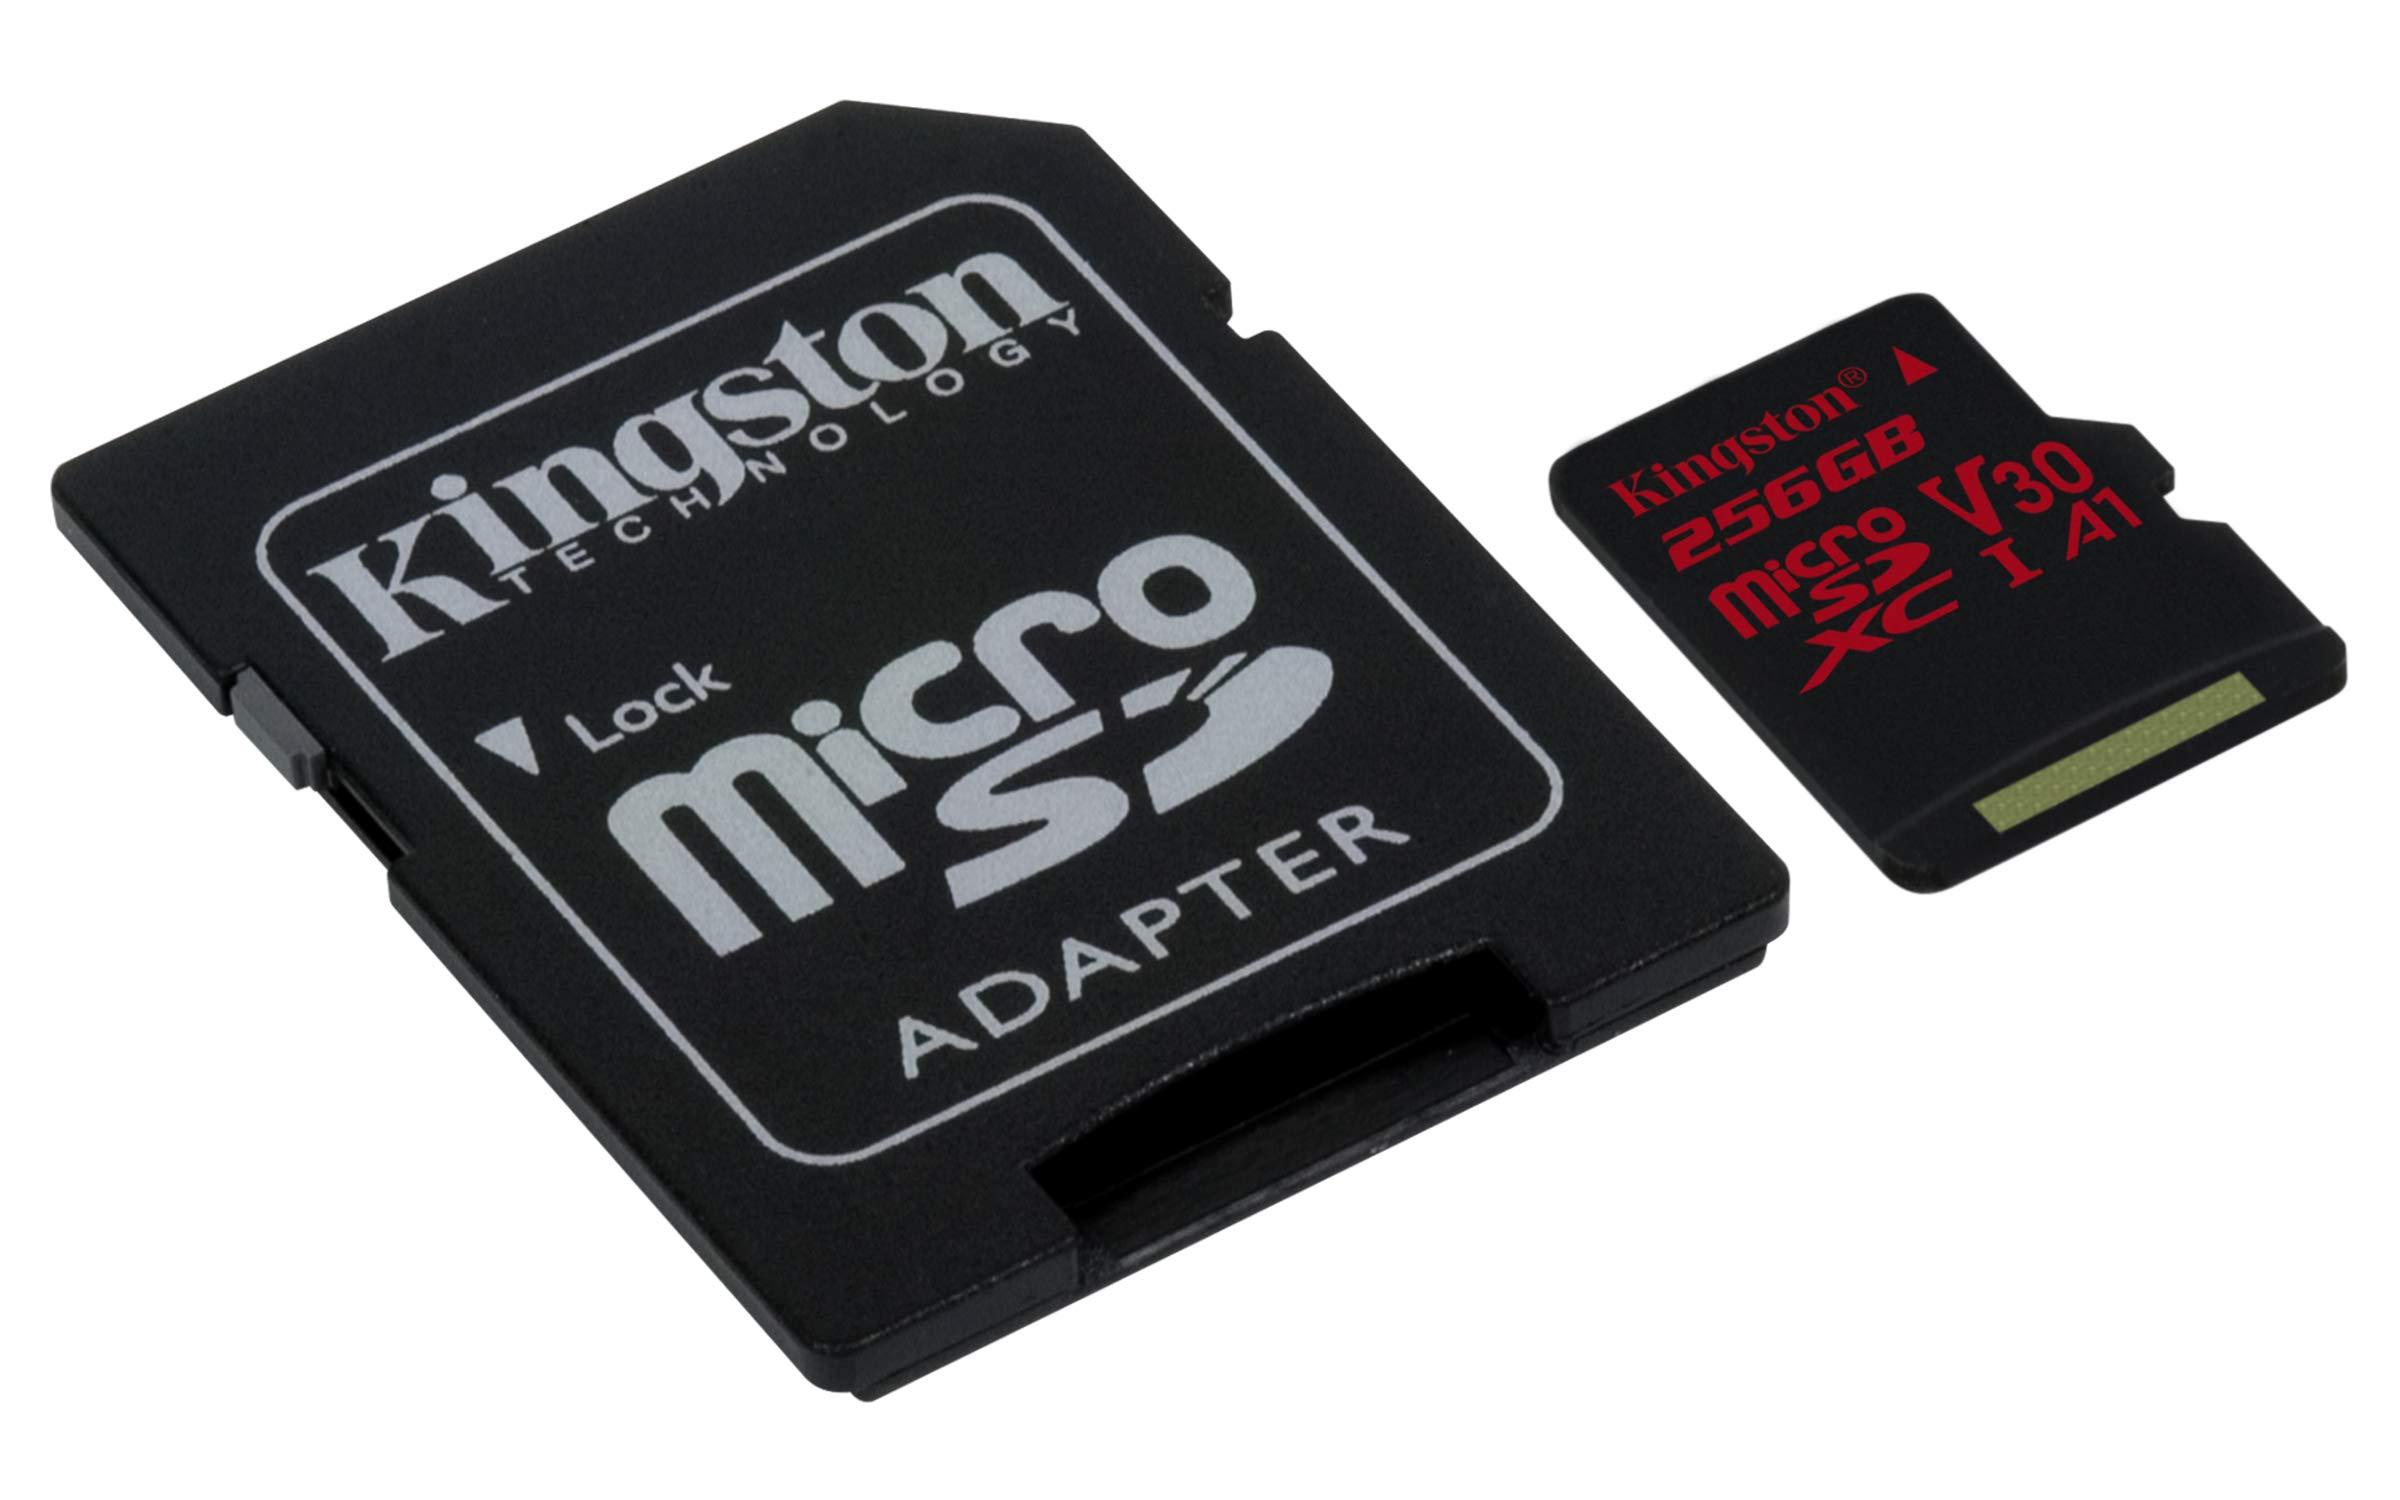 Kingston Digital SDCR/256GB Canvas React 256GB microSDXC Class 10 microSD Memory Card UHS-I 100MB/s R Flash Memory High Speed microSD Card with Adapter by Kingston (Image #1)